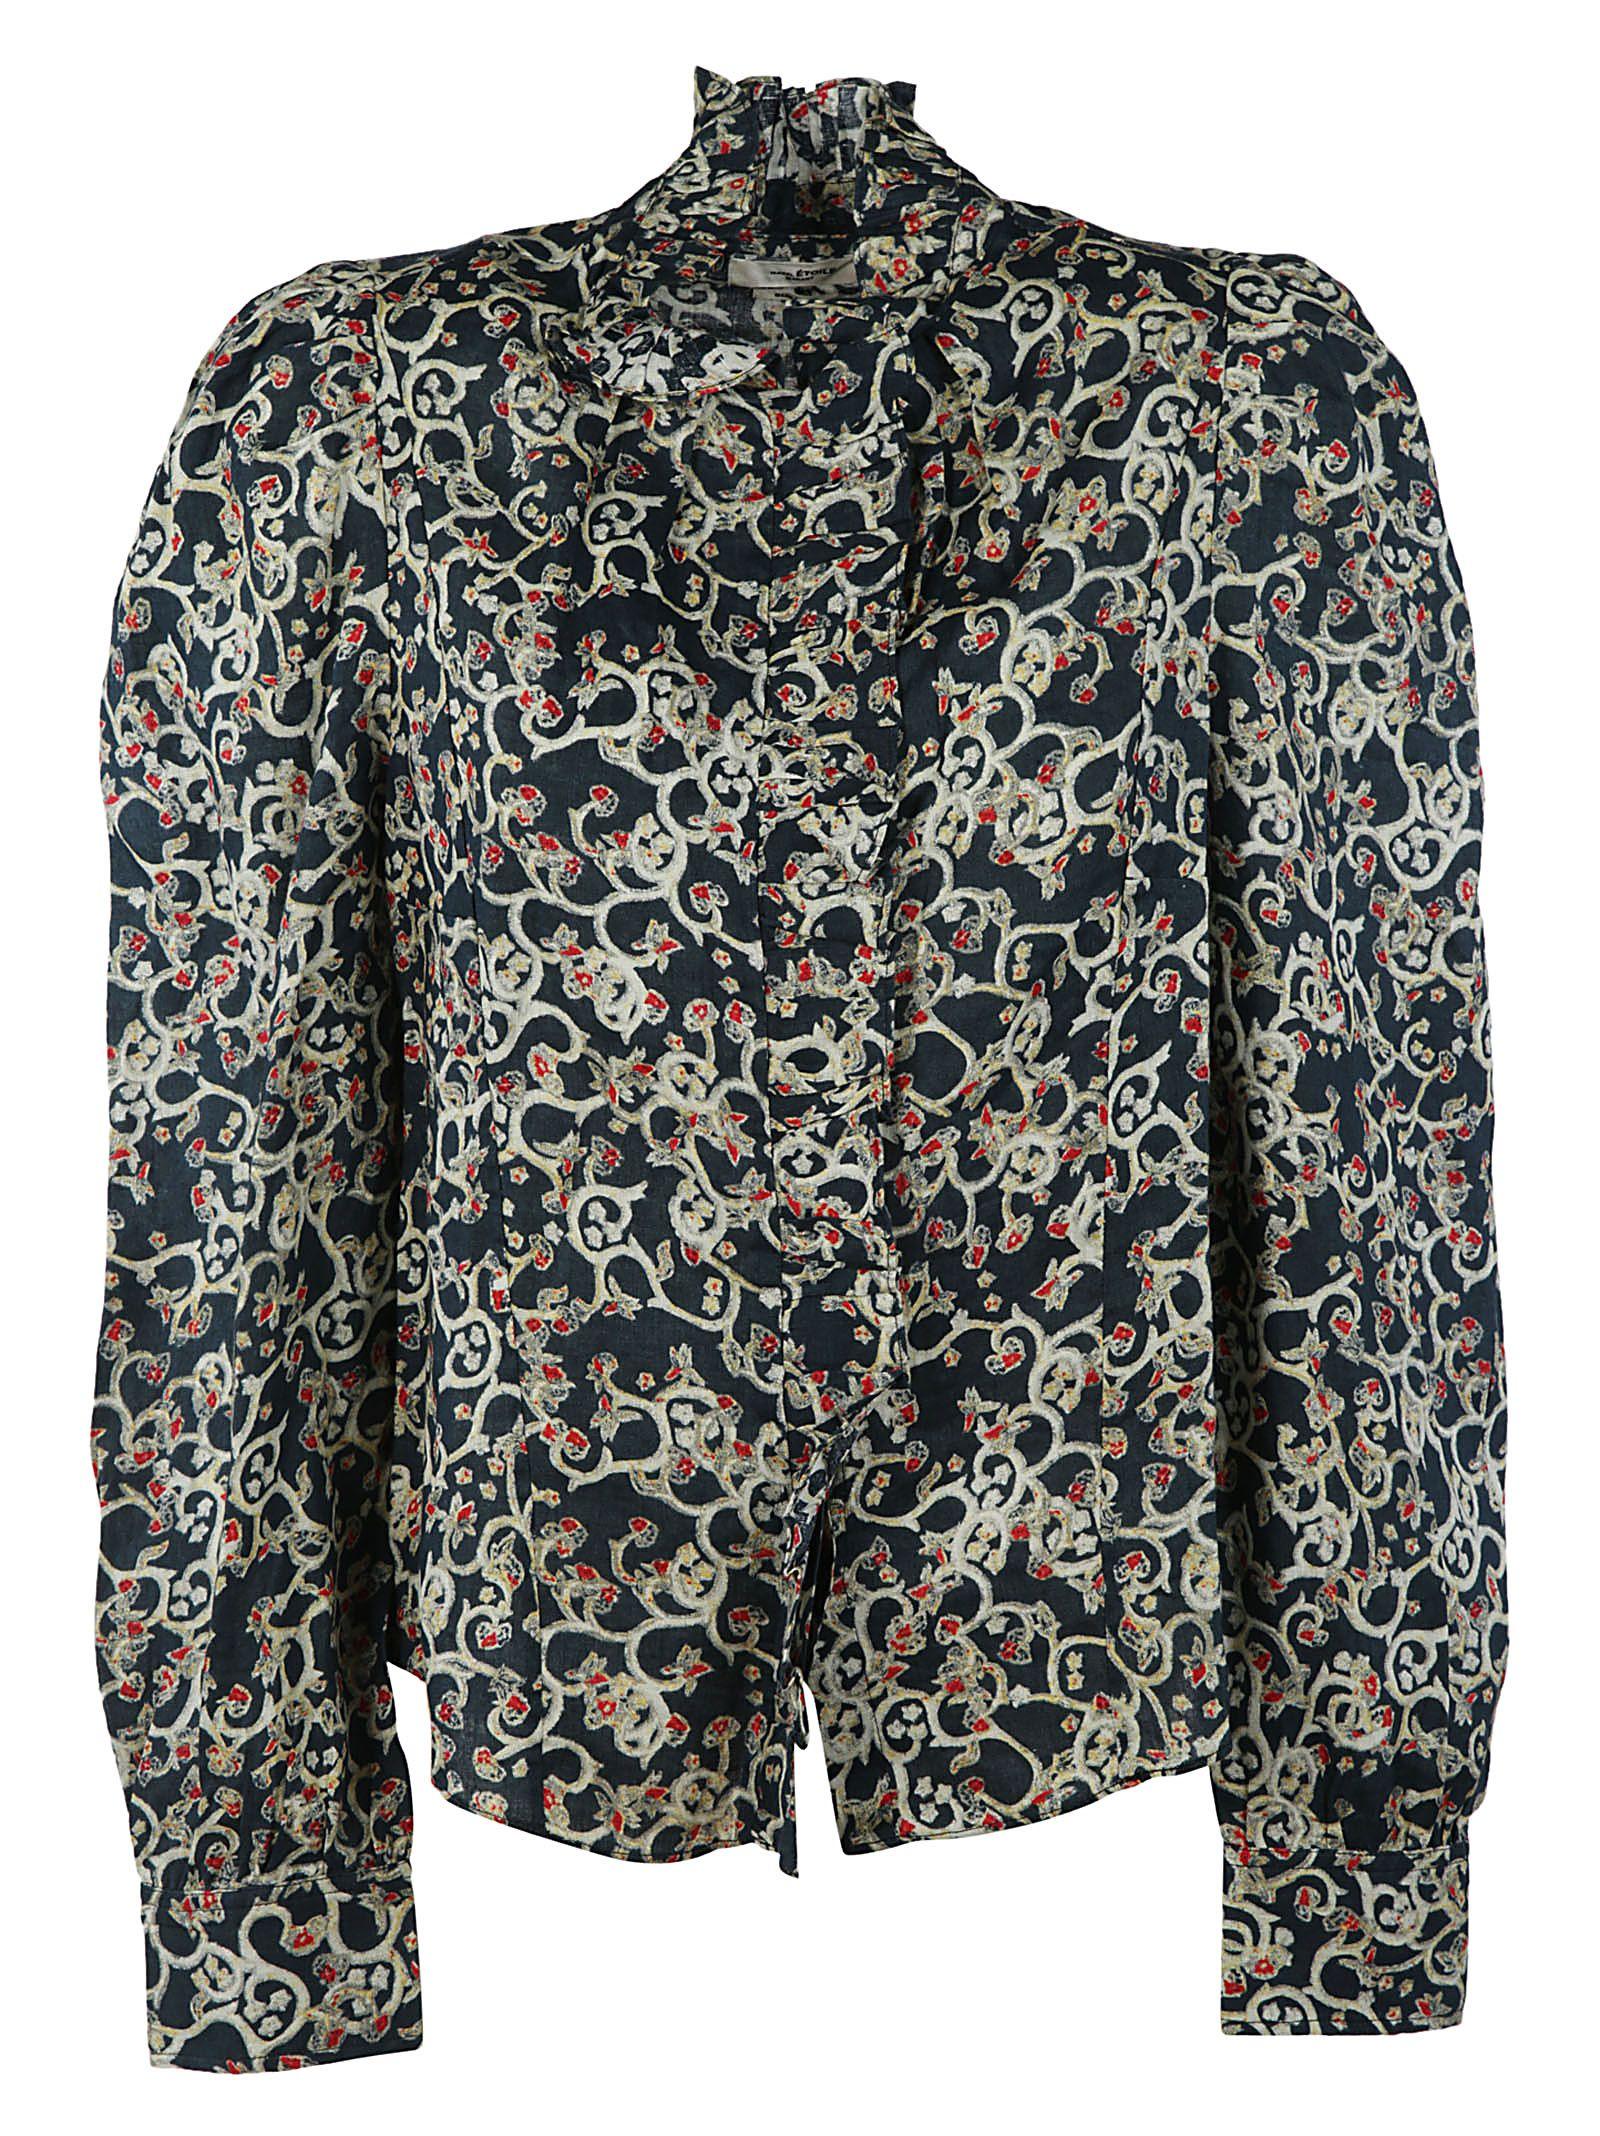 Isabel Marant Vines Shirt